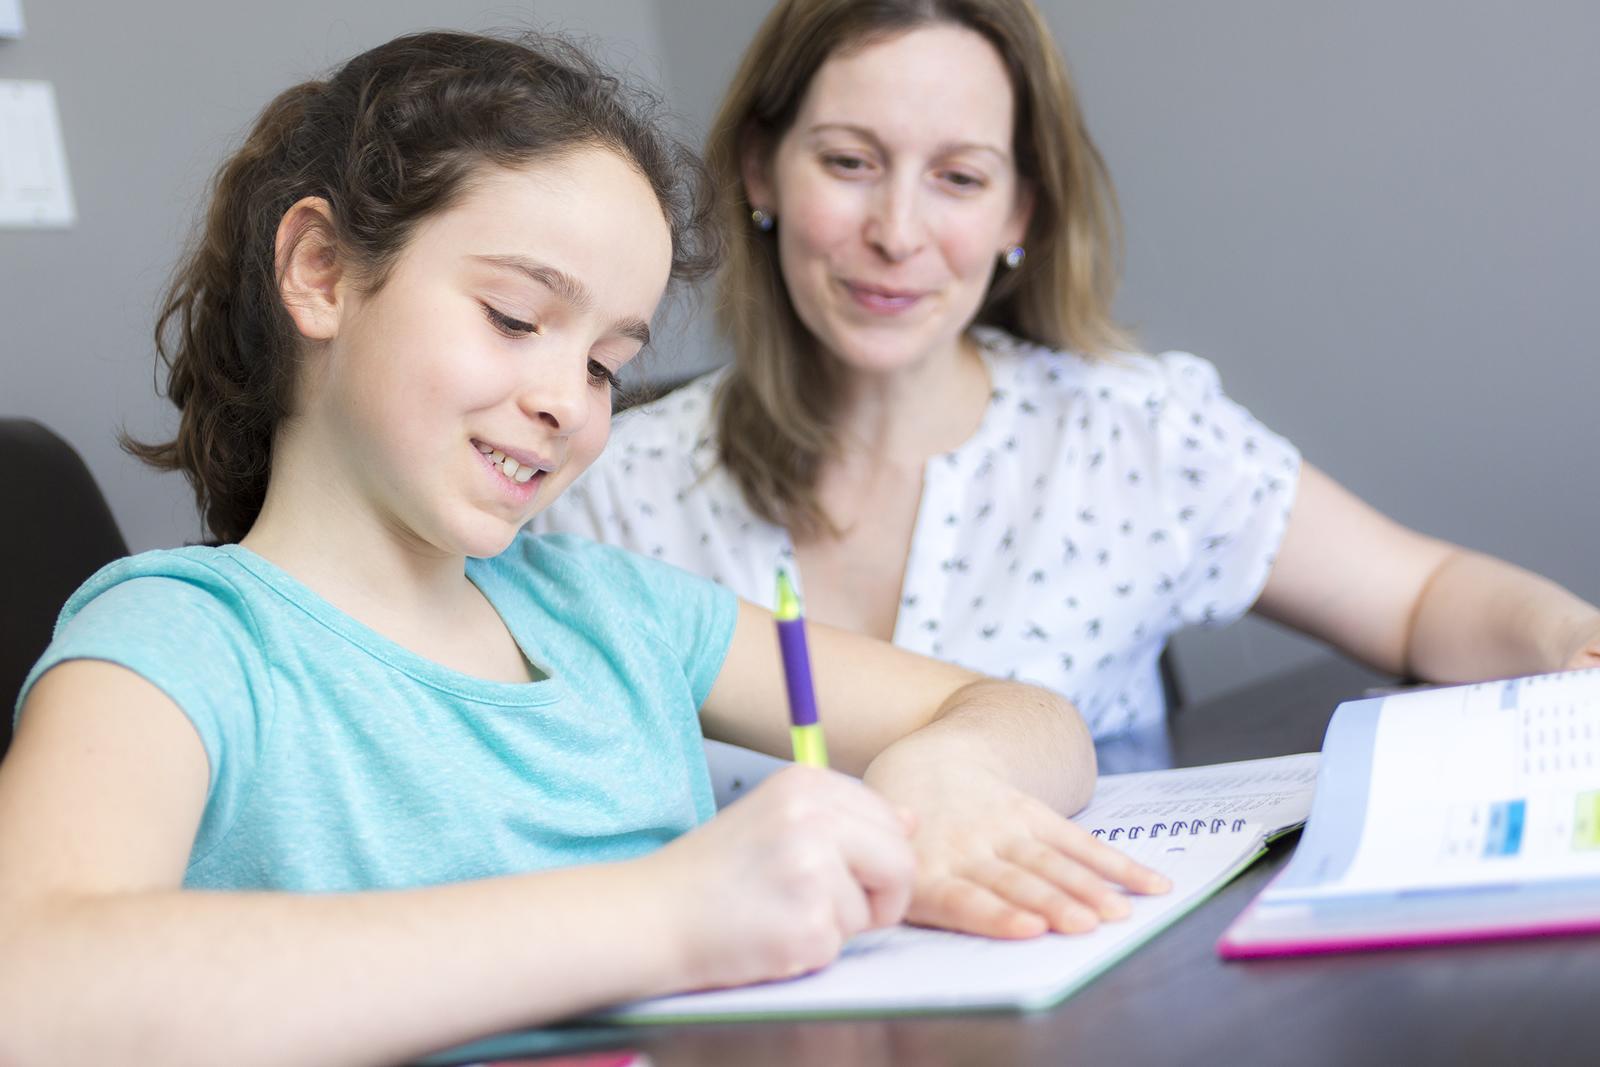 Tutors for Children - English Maths History & Other Subjects - Weybridge Elmbridge Surrey Tutors